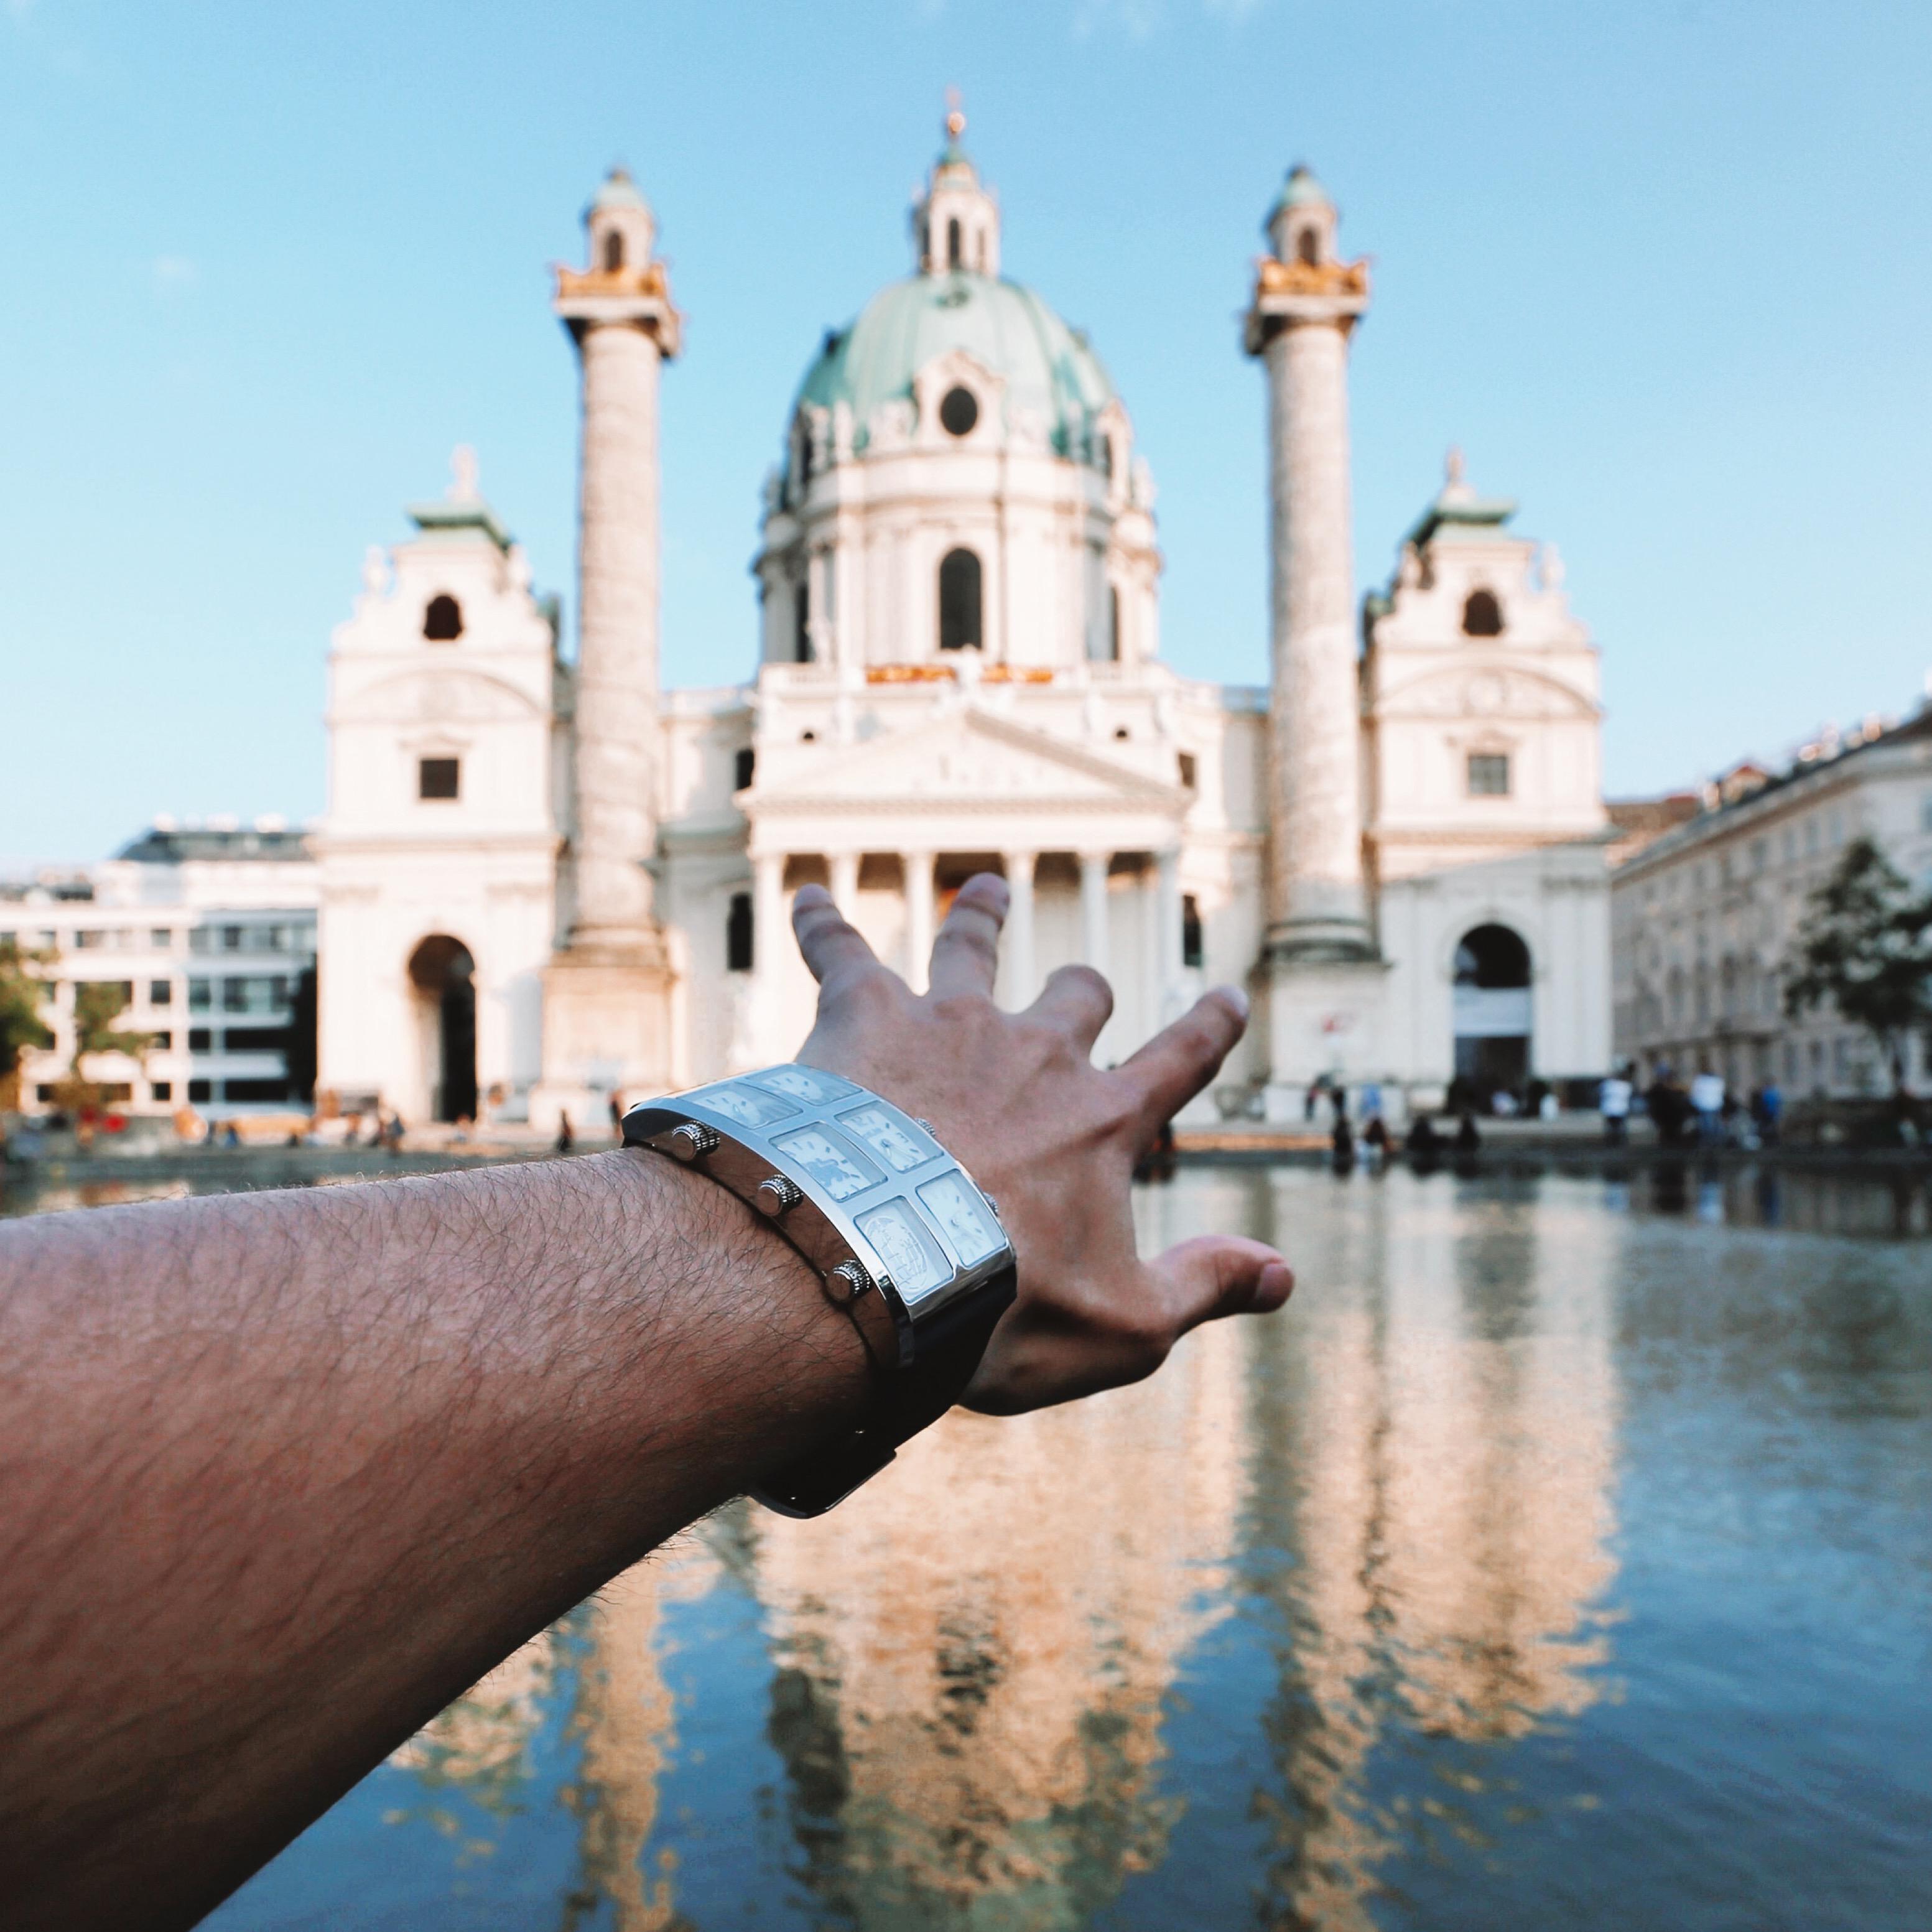 Man wearing Zhu 60mm Multi-Time Zone Watch in front of church